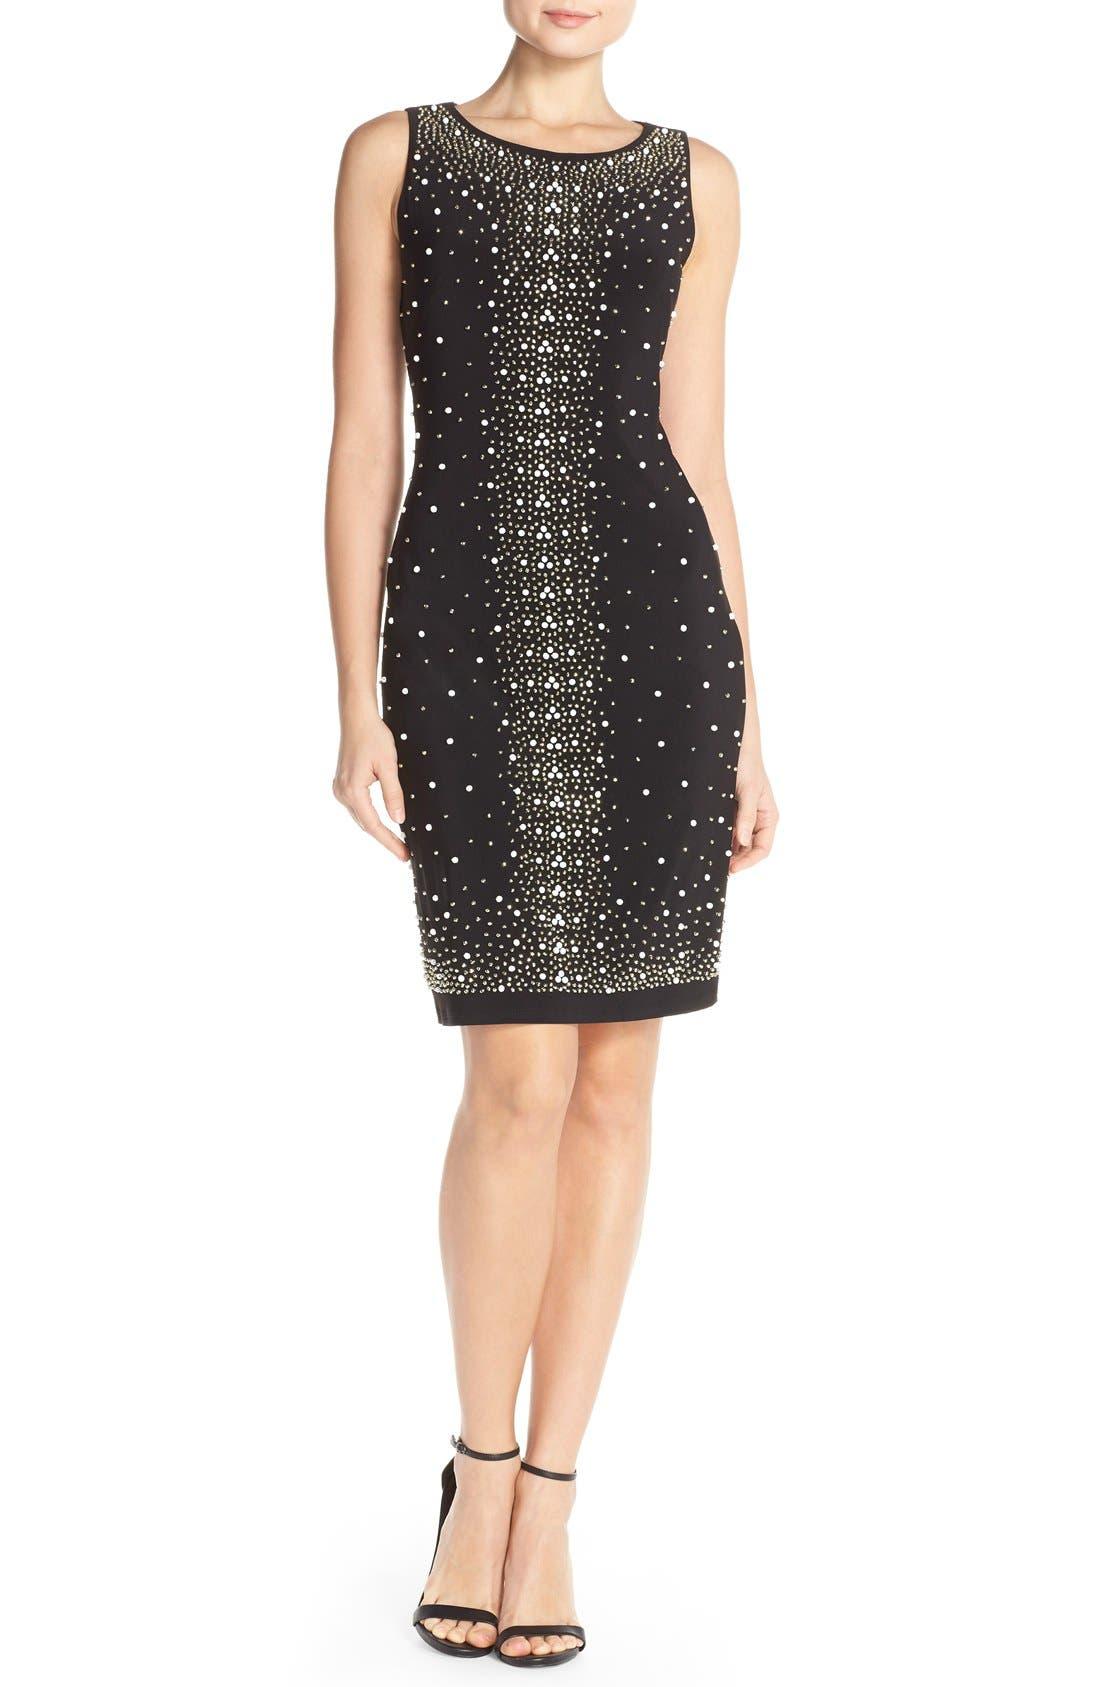 Alternate Image 1 Selected - Chetta B Placed Bead Sleeveless Party Dress